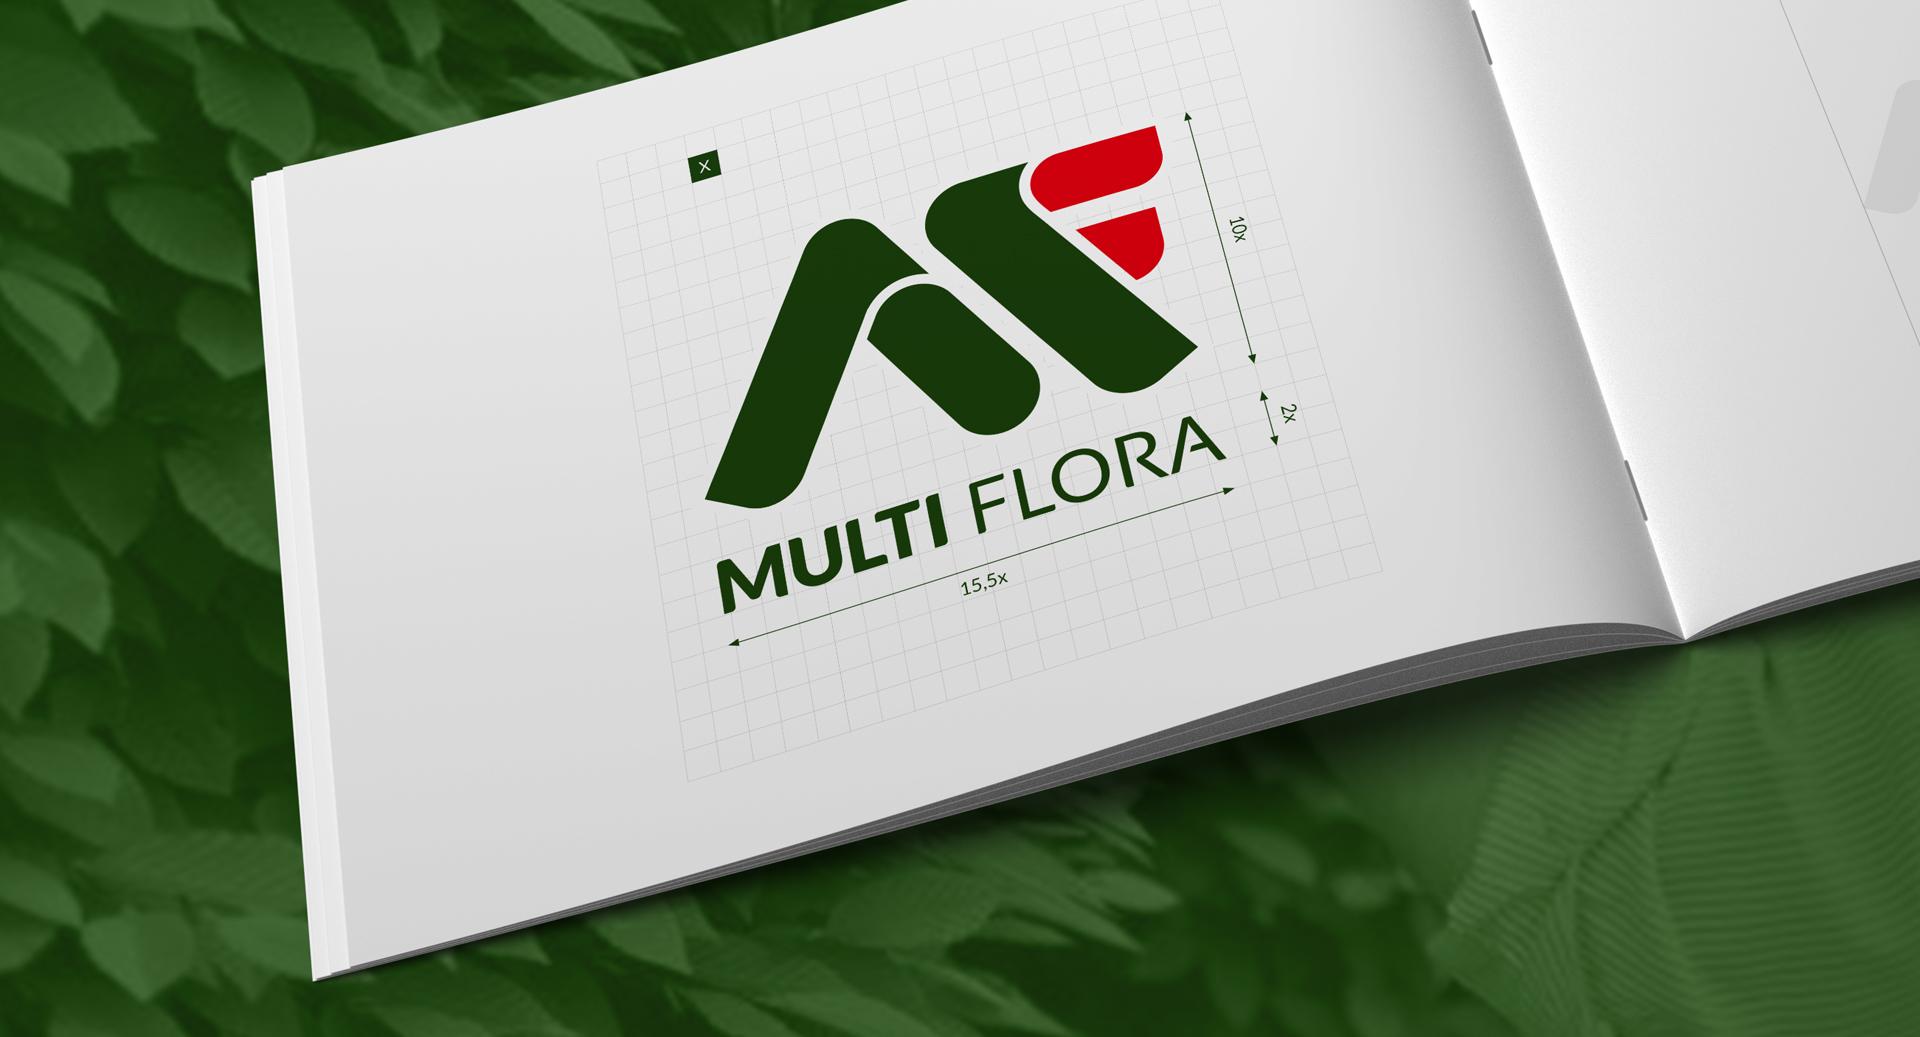 projekt-ksiega-znaku-multiflora